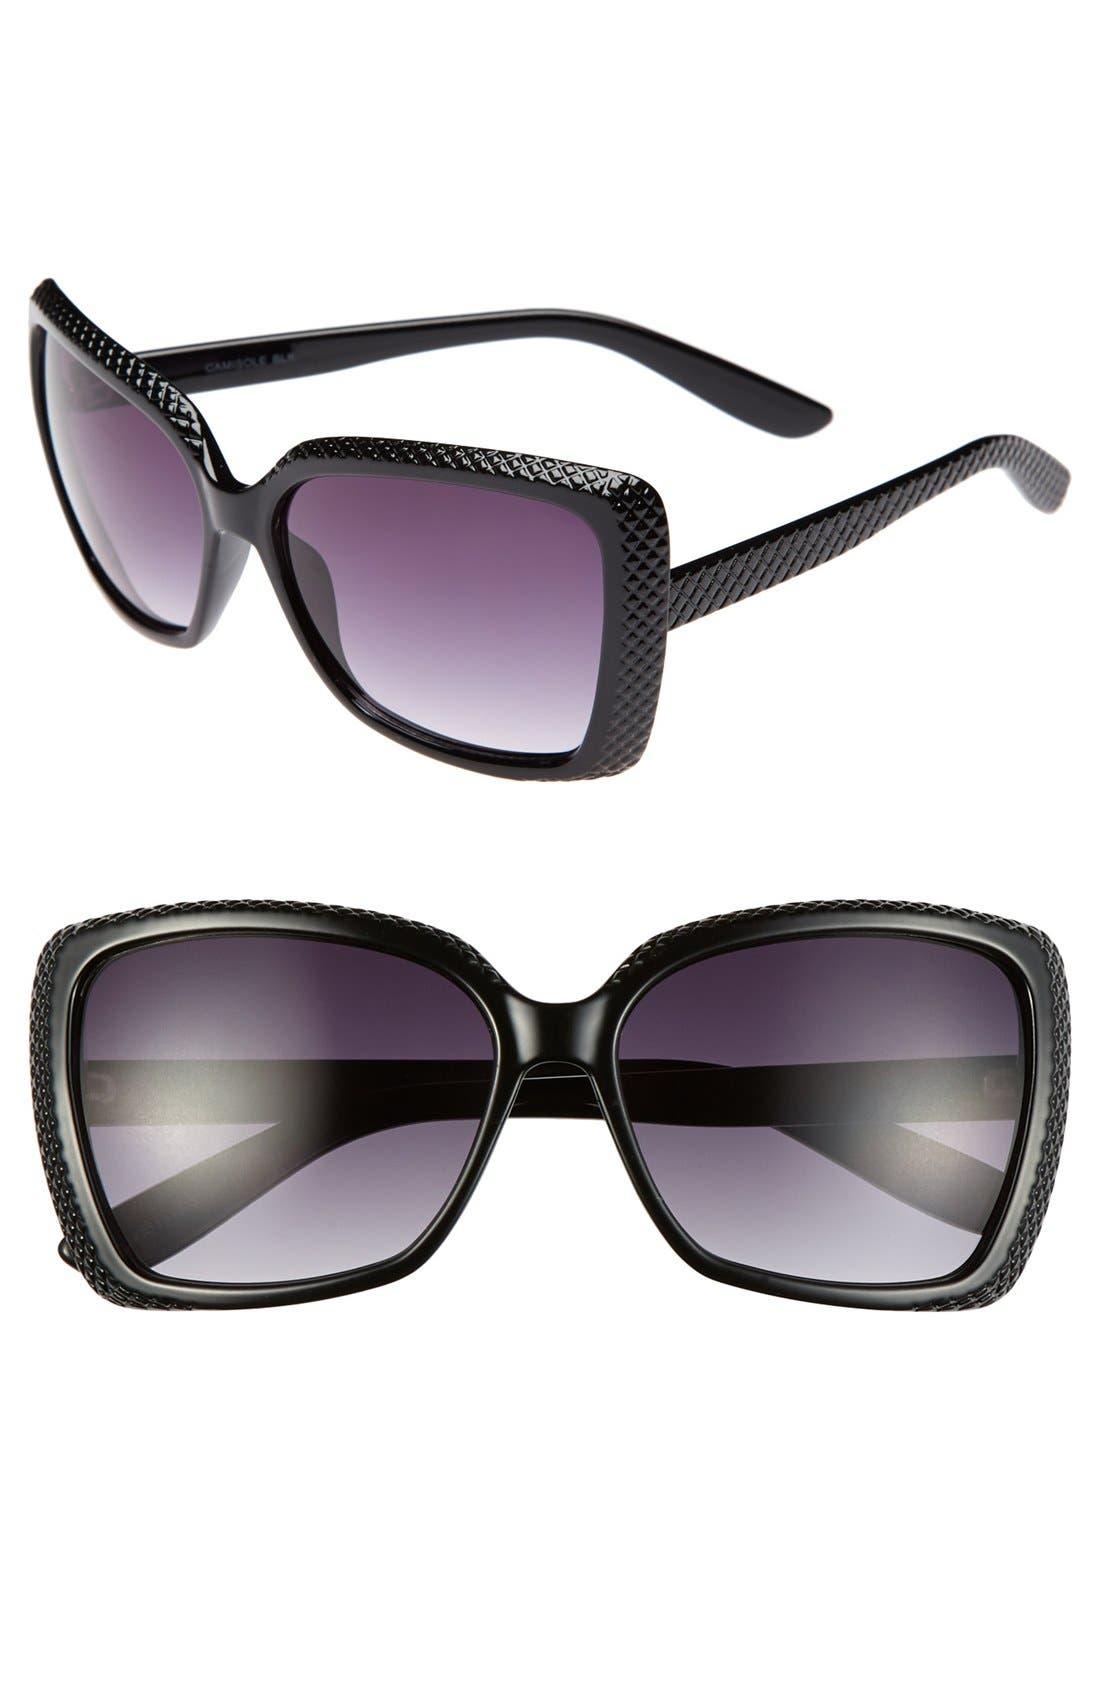 Main Image - Outlook Eyewear 58mm Retro Sunglasses